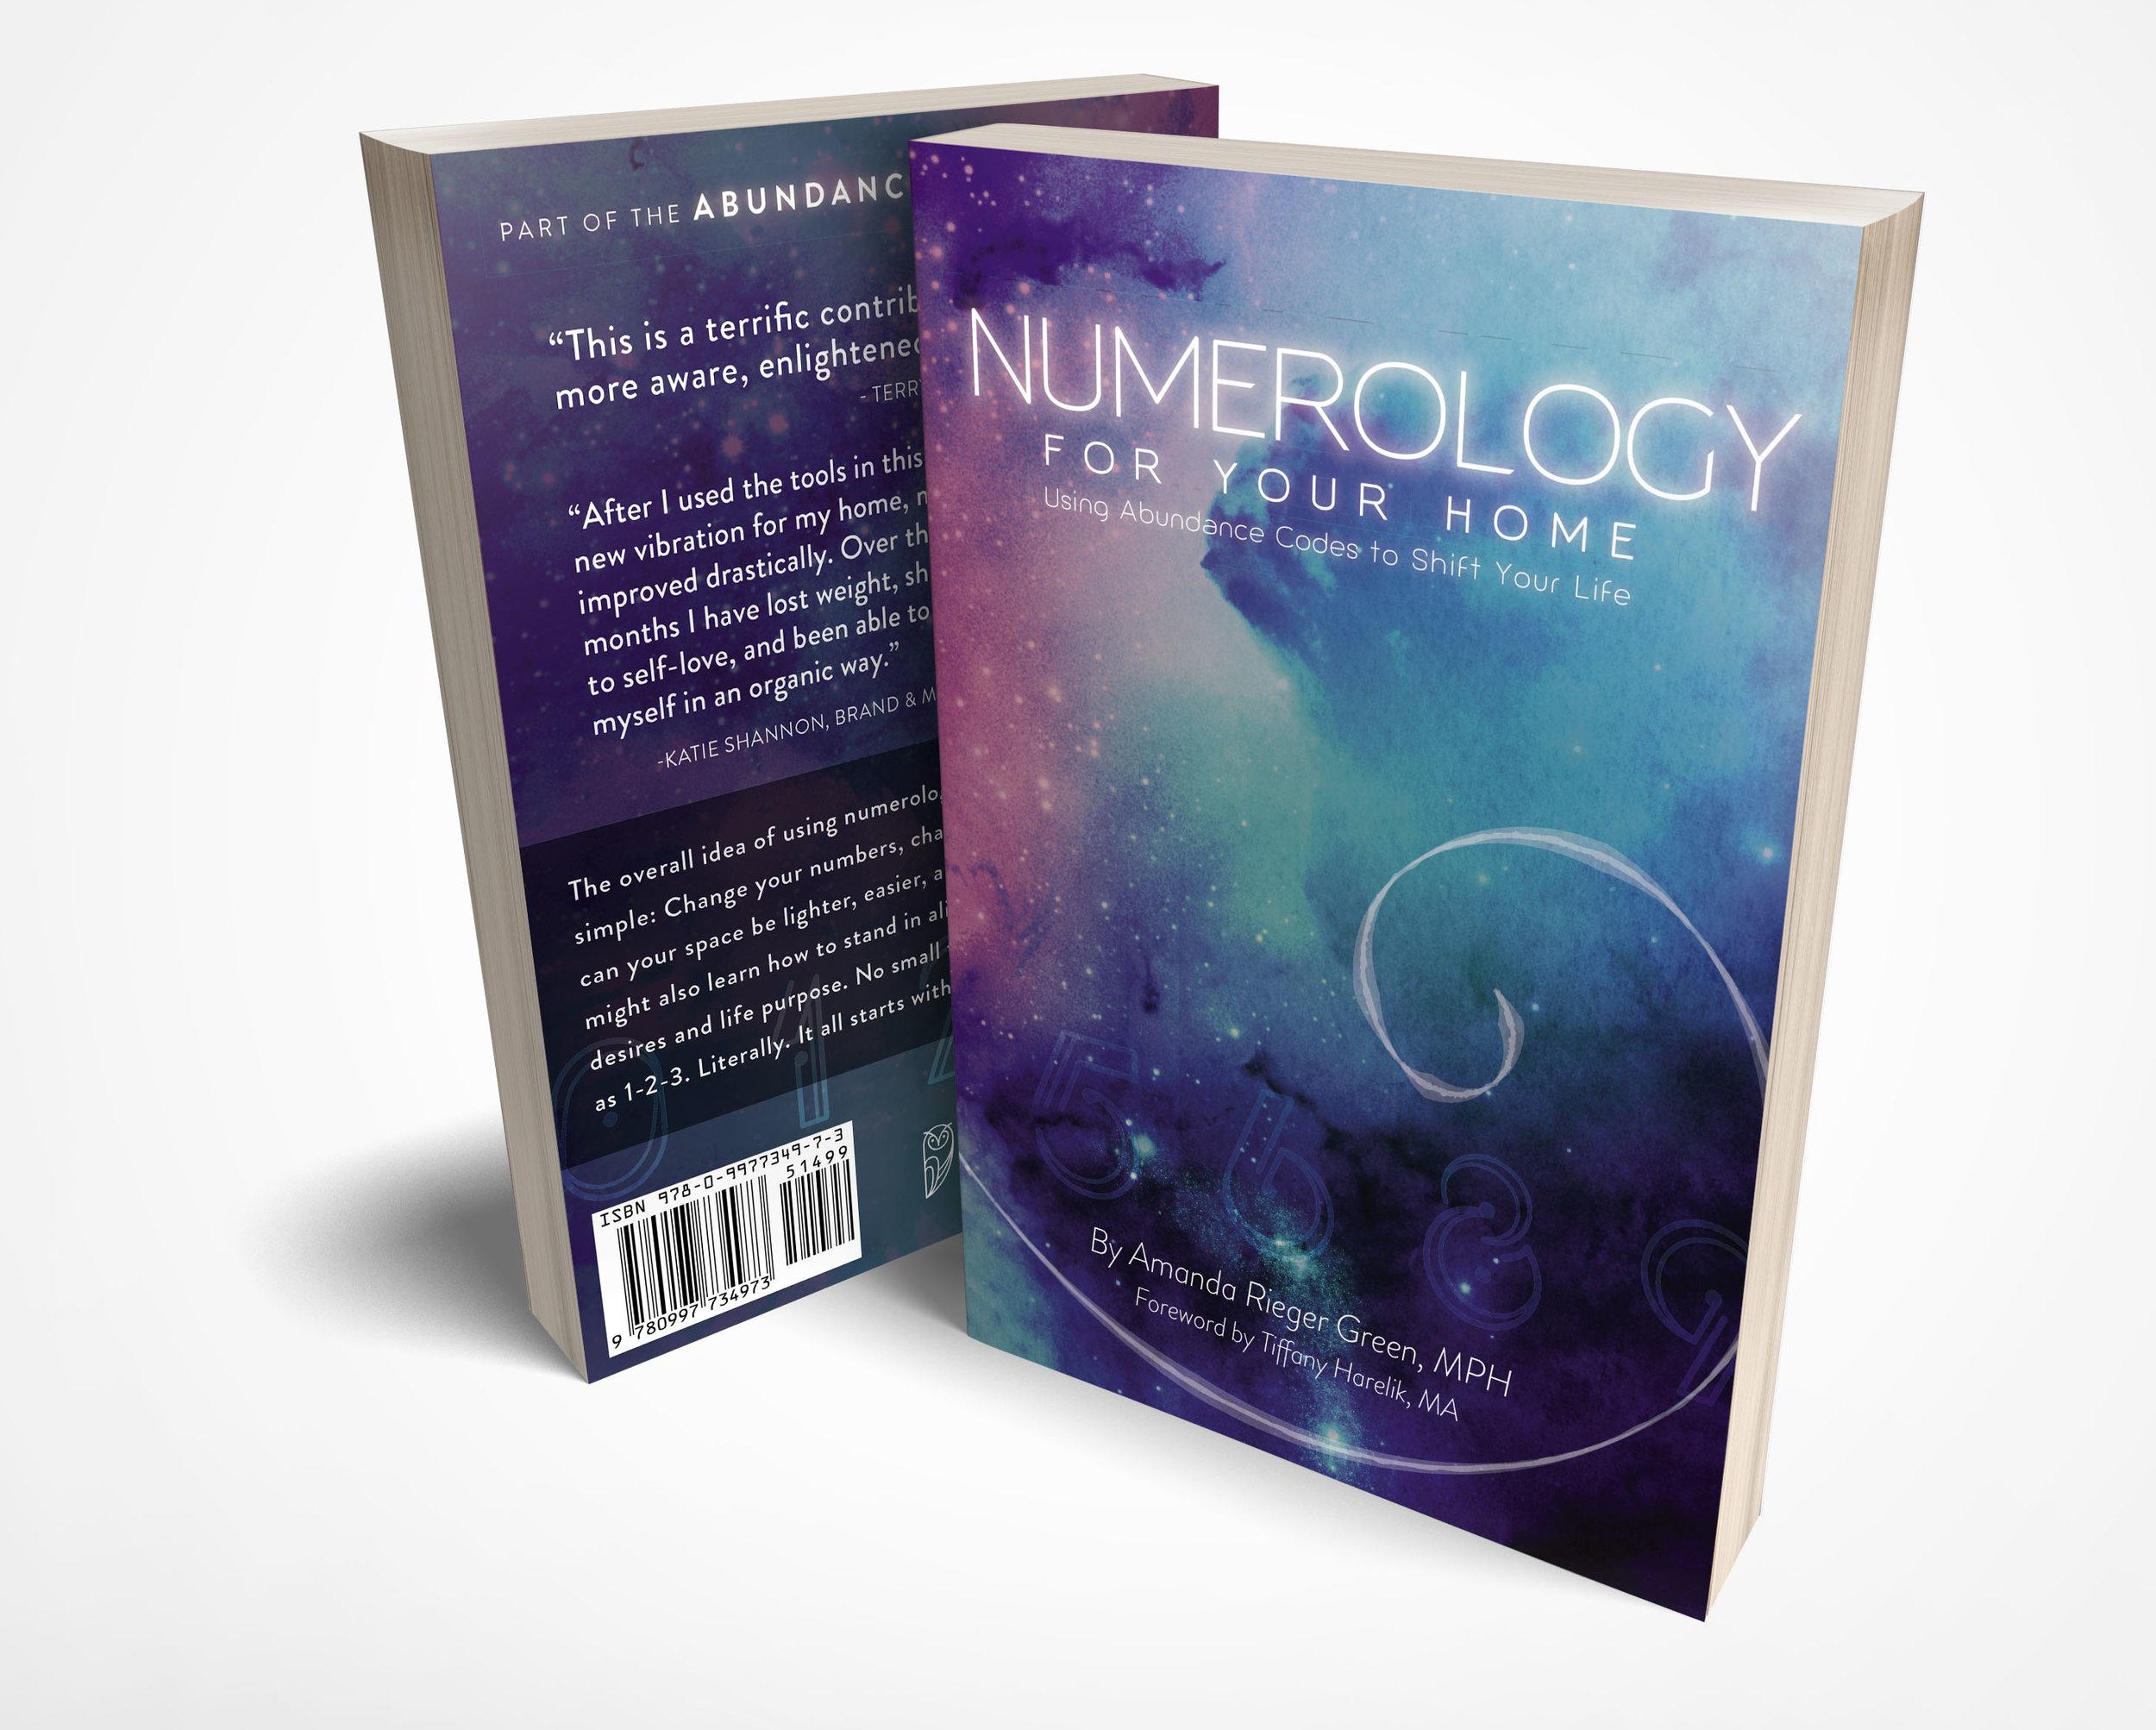 085-6x9-Front-Back-Paperback-NUMEROLOGY.jpg